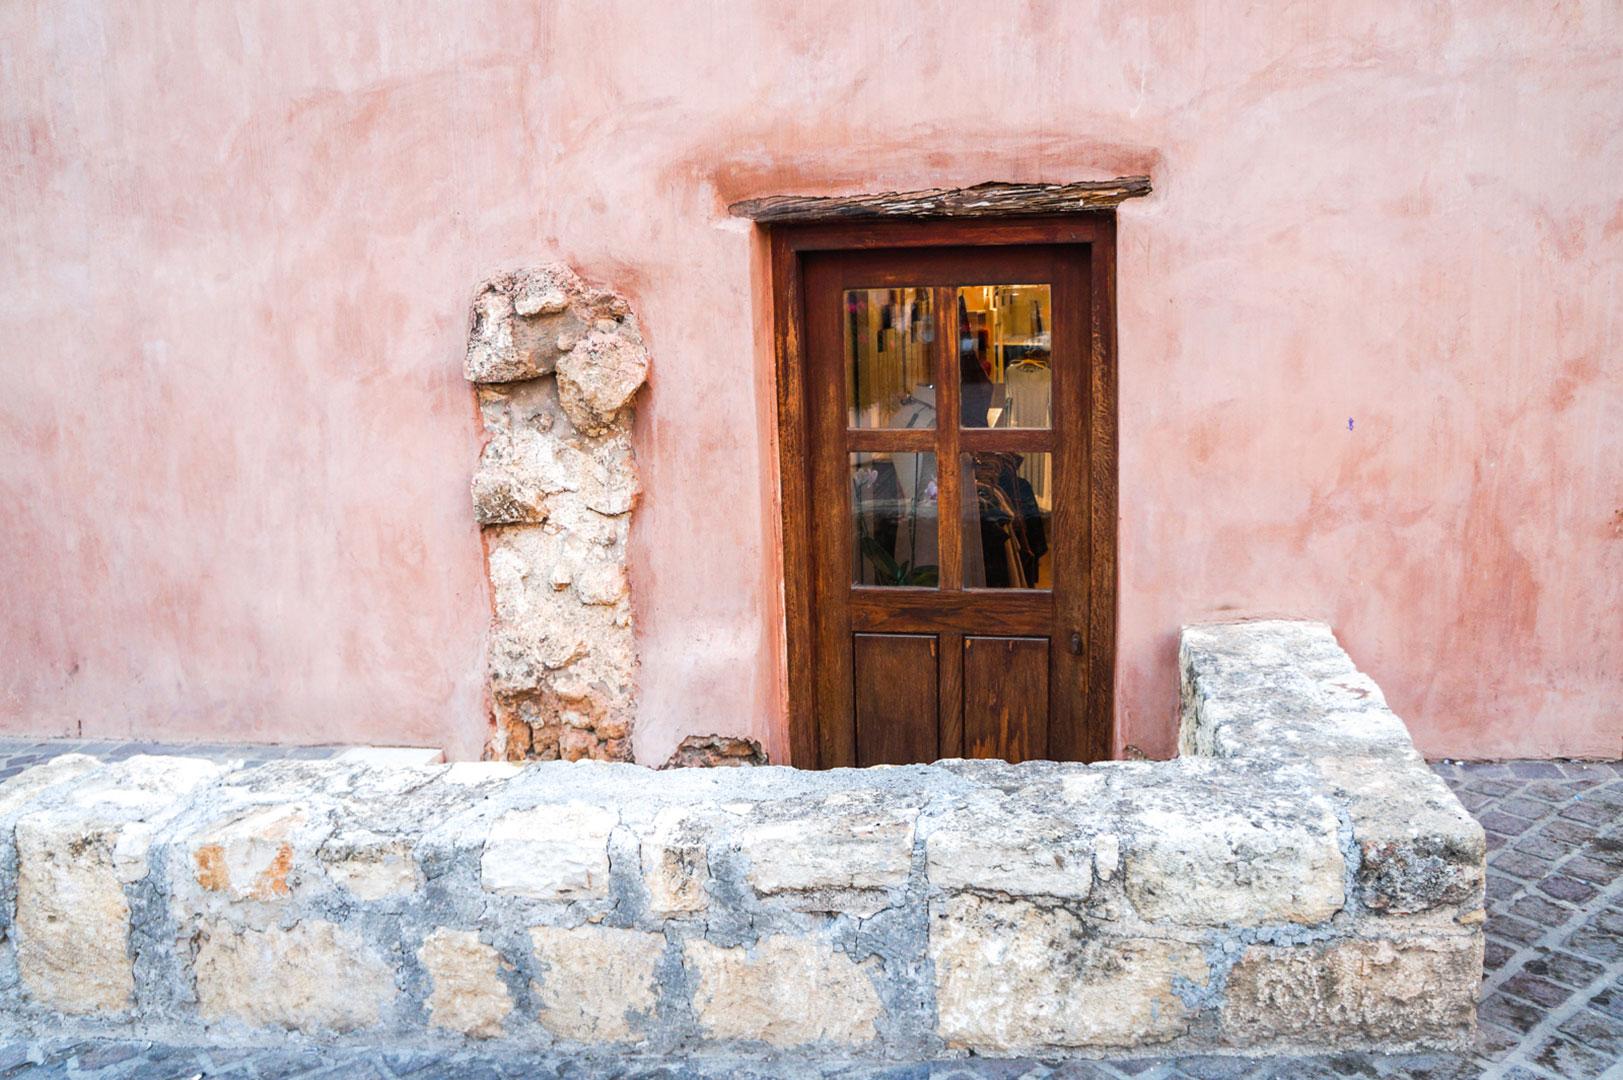 chania-crete-greece-la-vie-en-blog-all-rights-reserved-26